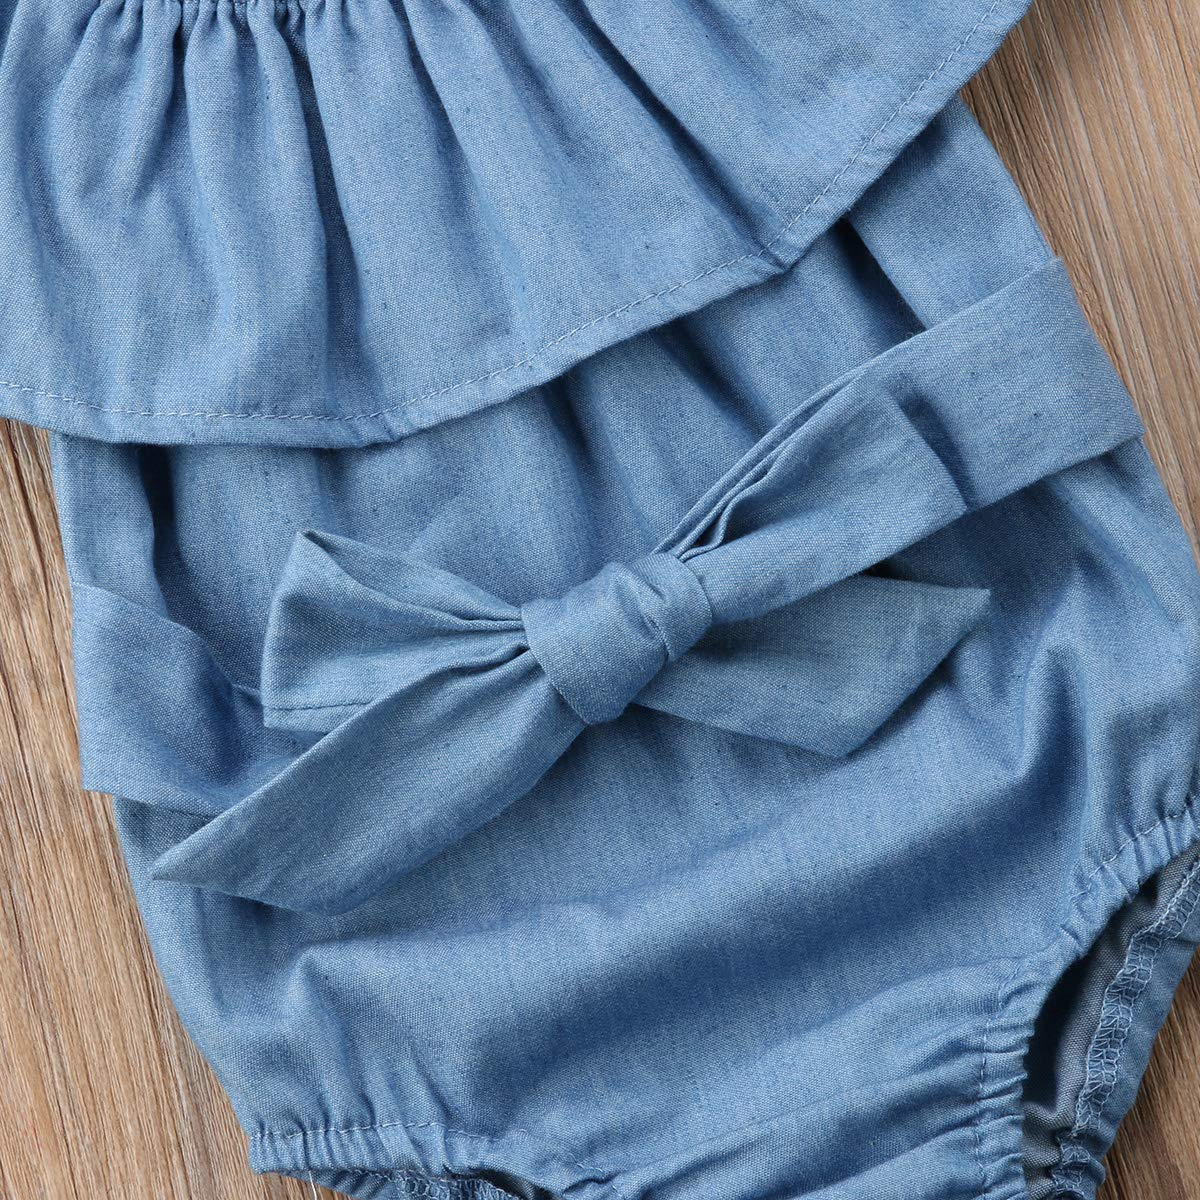 Newborn Kids Baby Girls Front Bowknot Bodysuit Romper Jumpsuit Outfits Set 0-24M